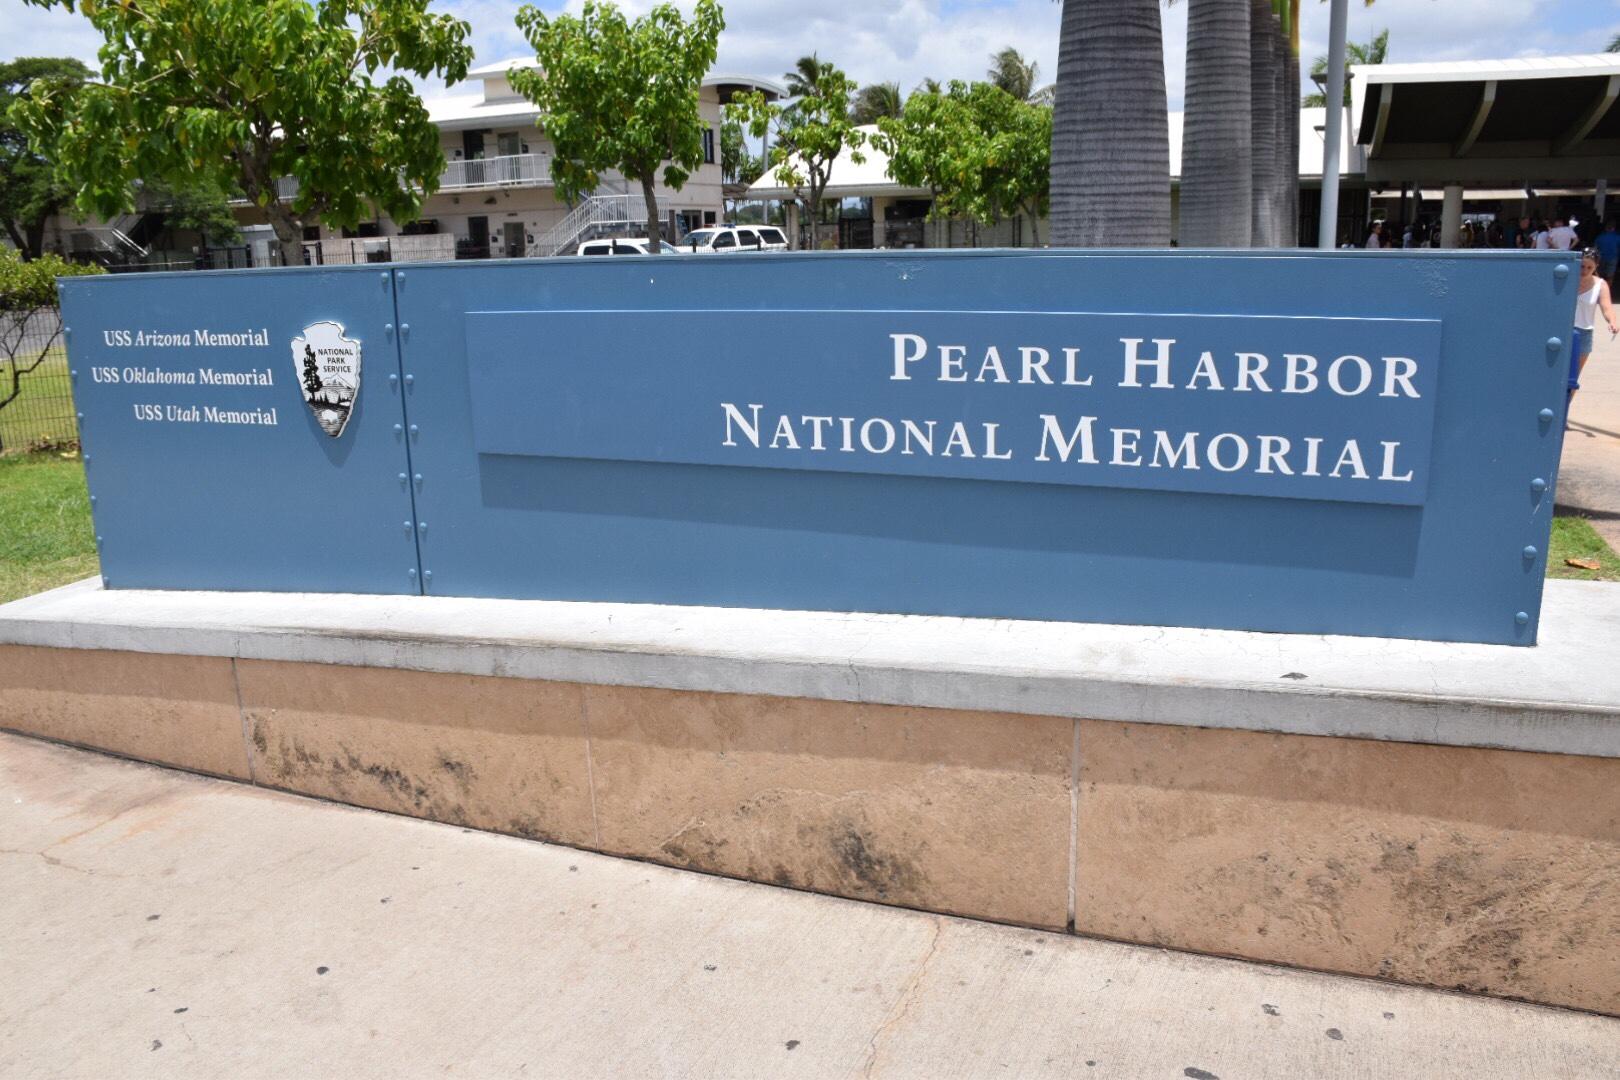 Hawaii Day 3 Pearl Harbor July 19